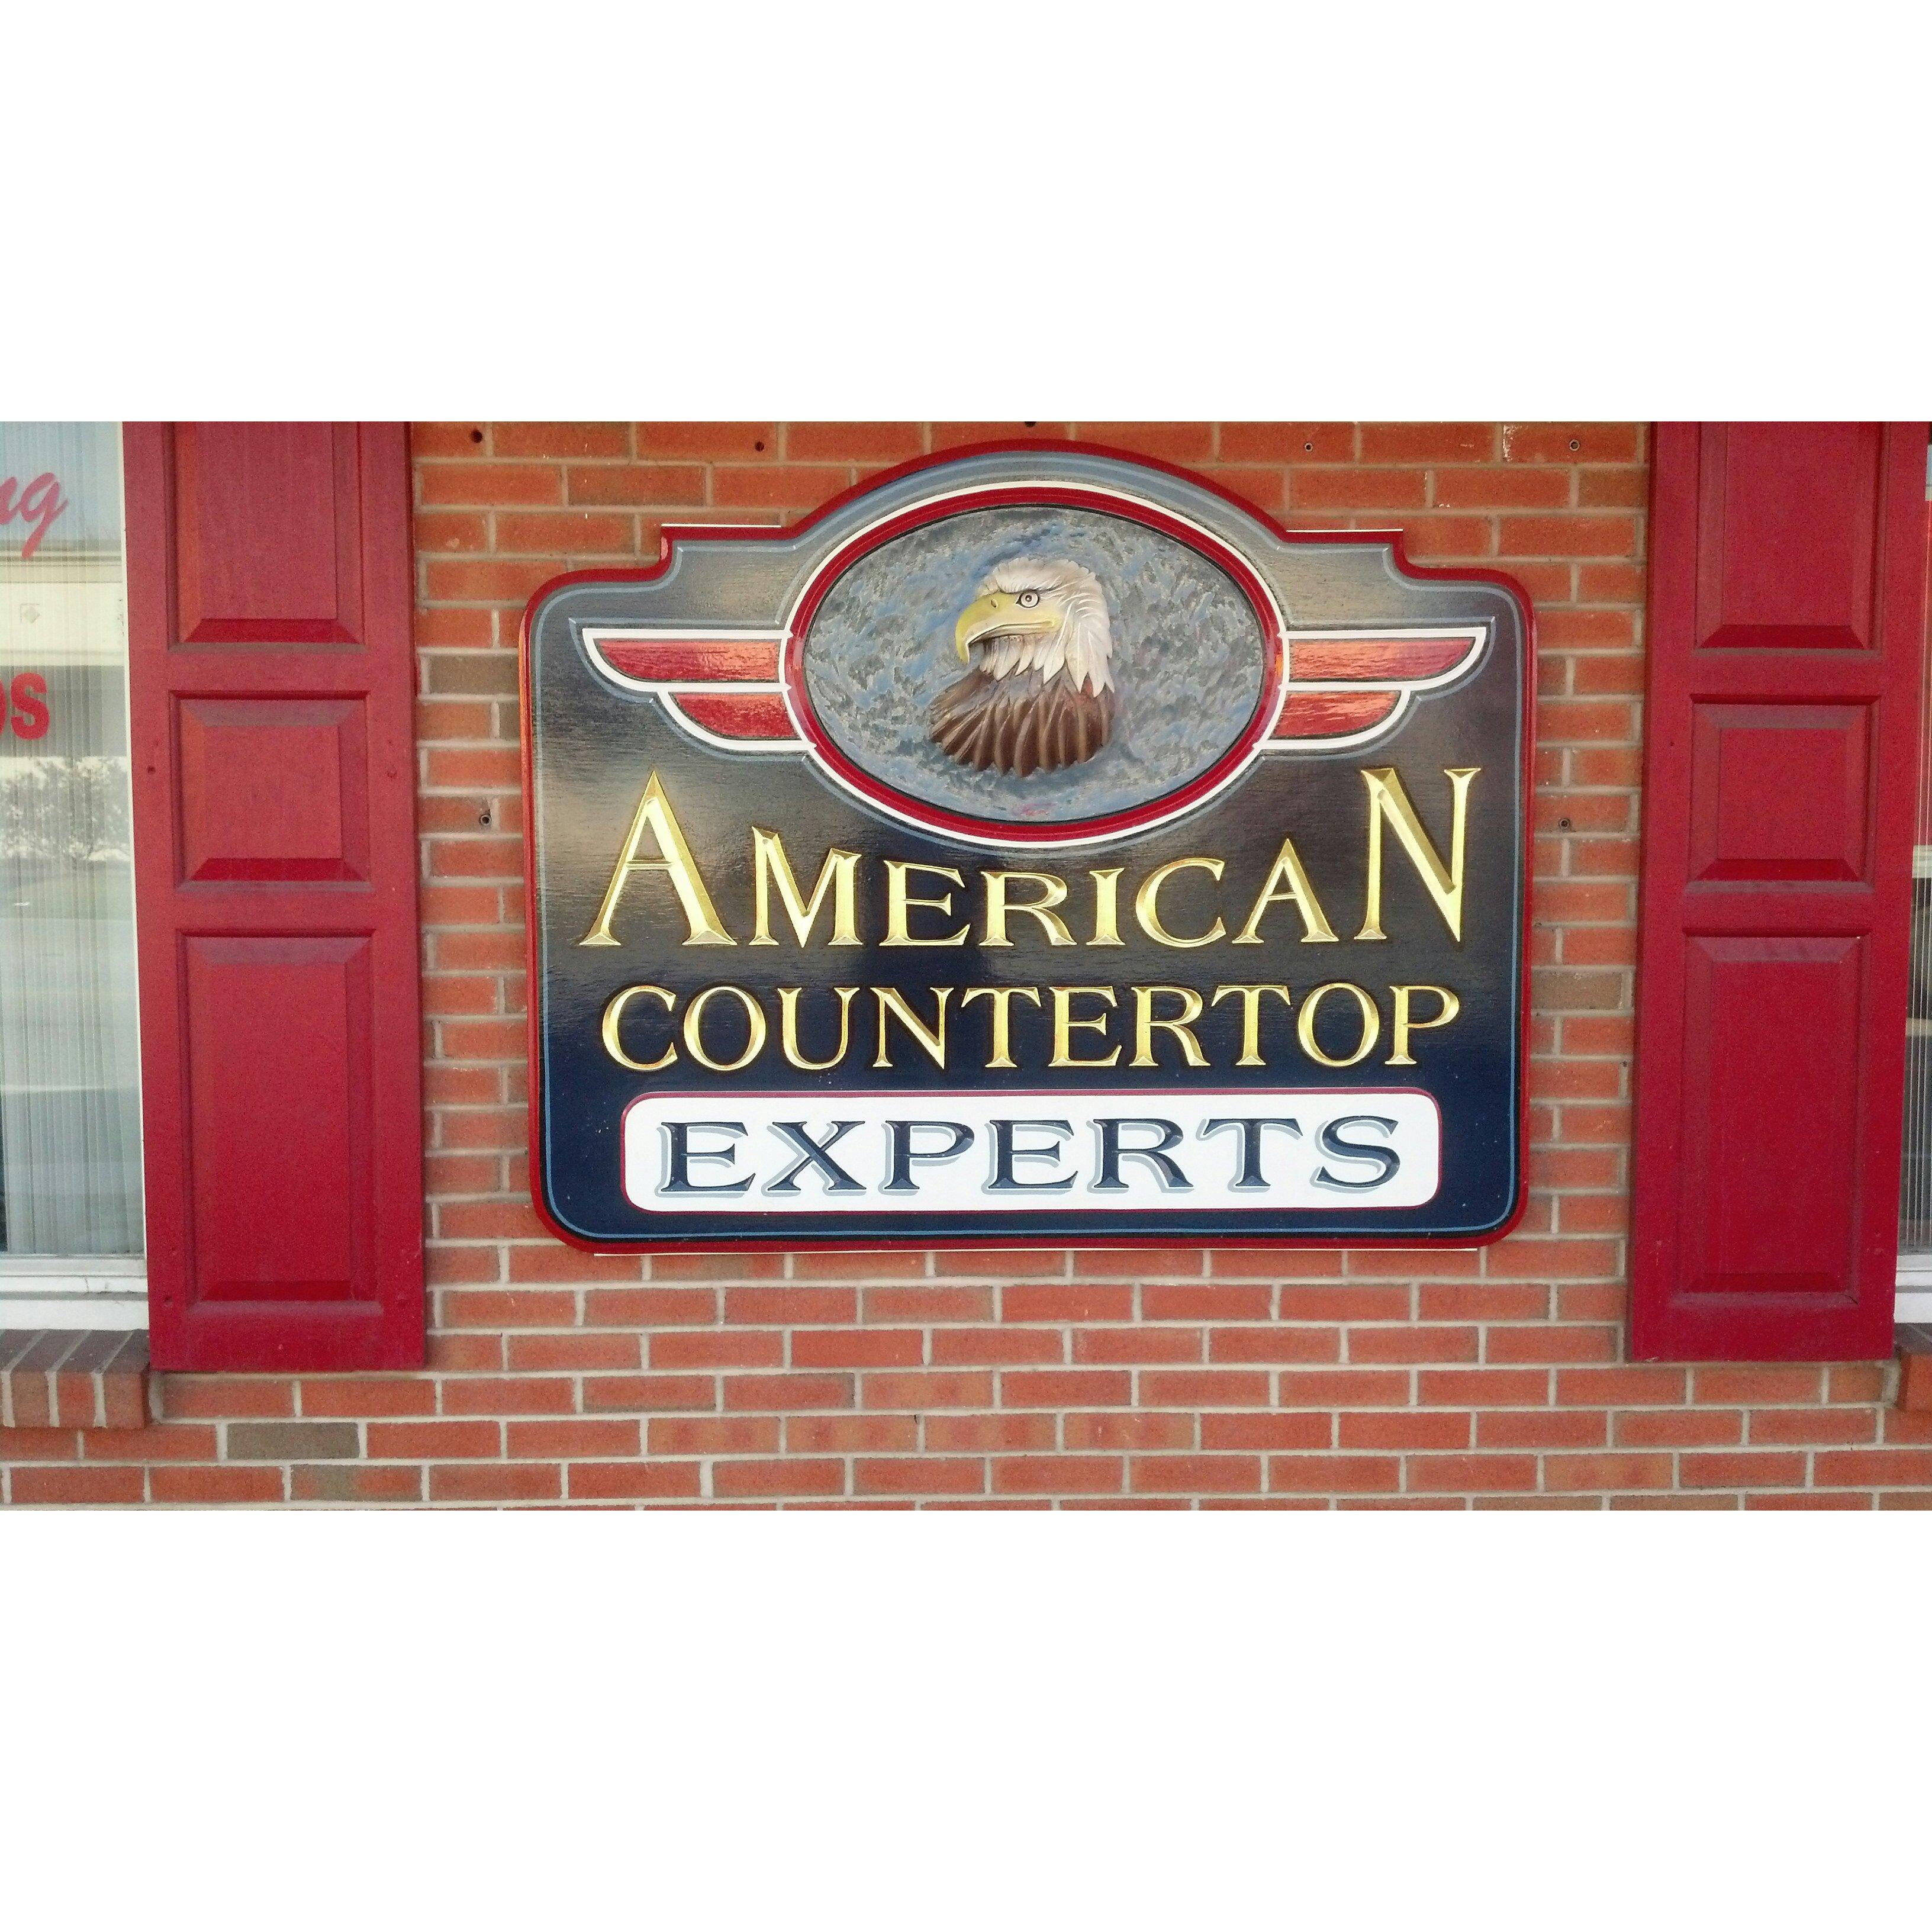 American Countertop Experts